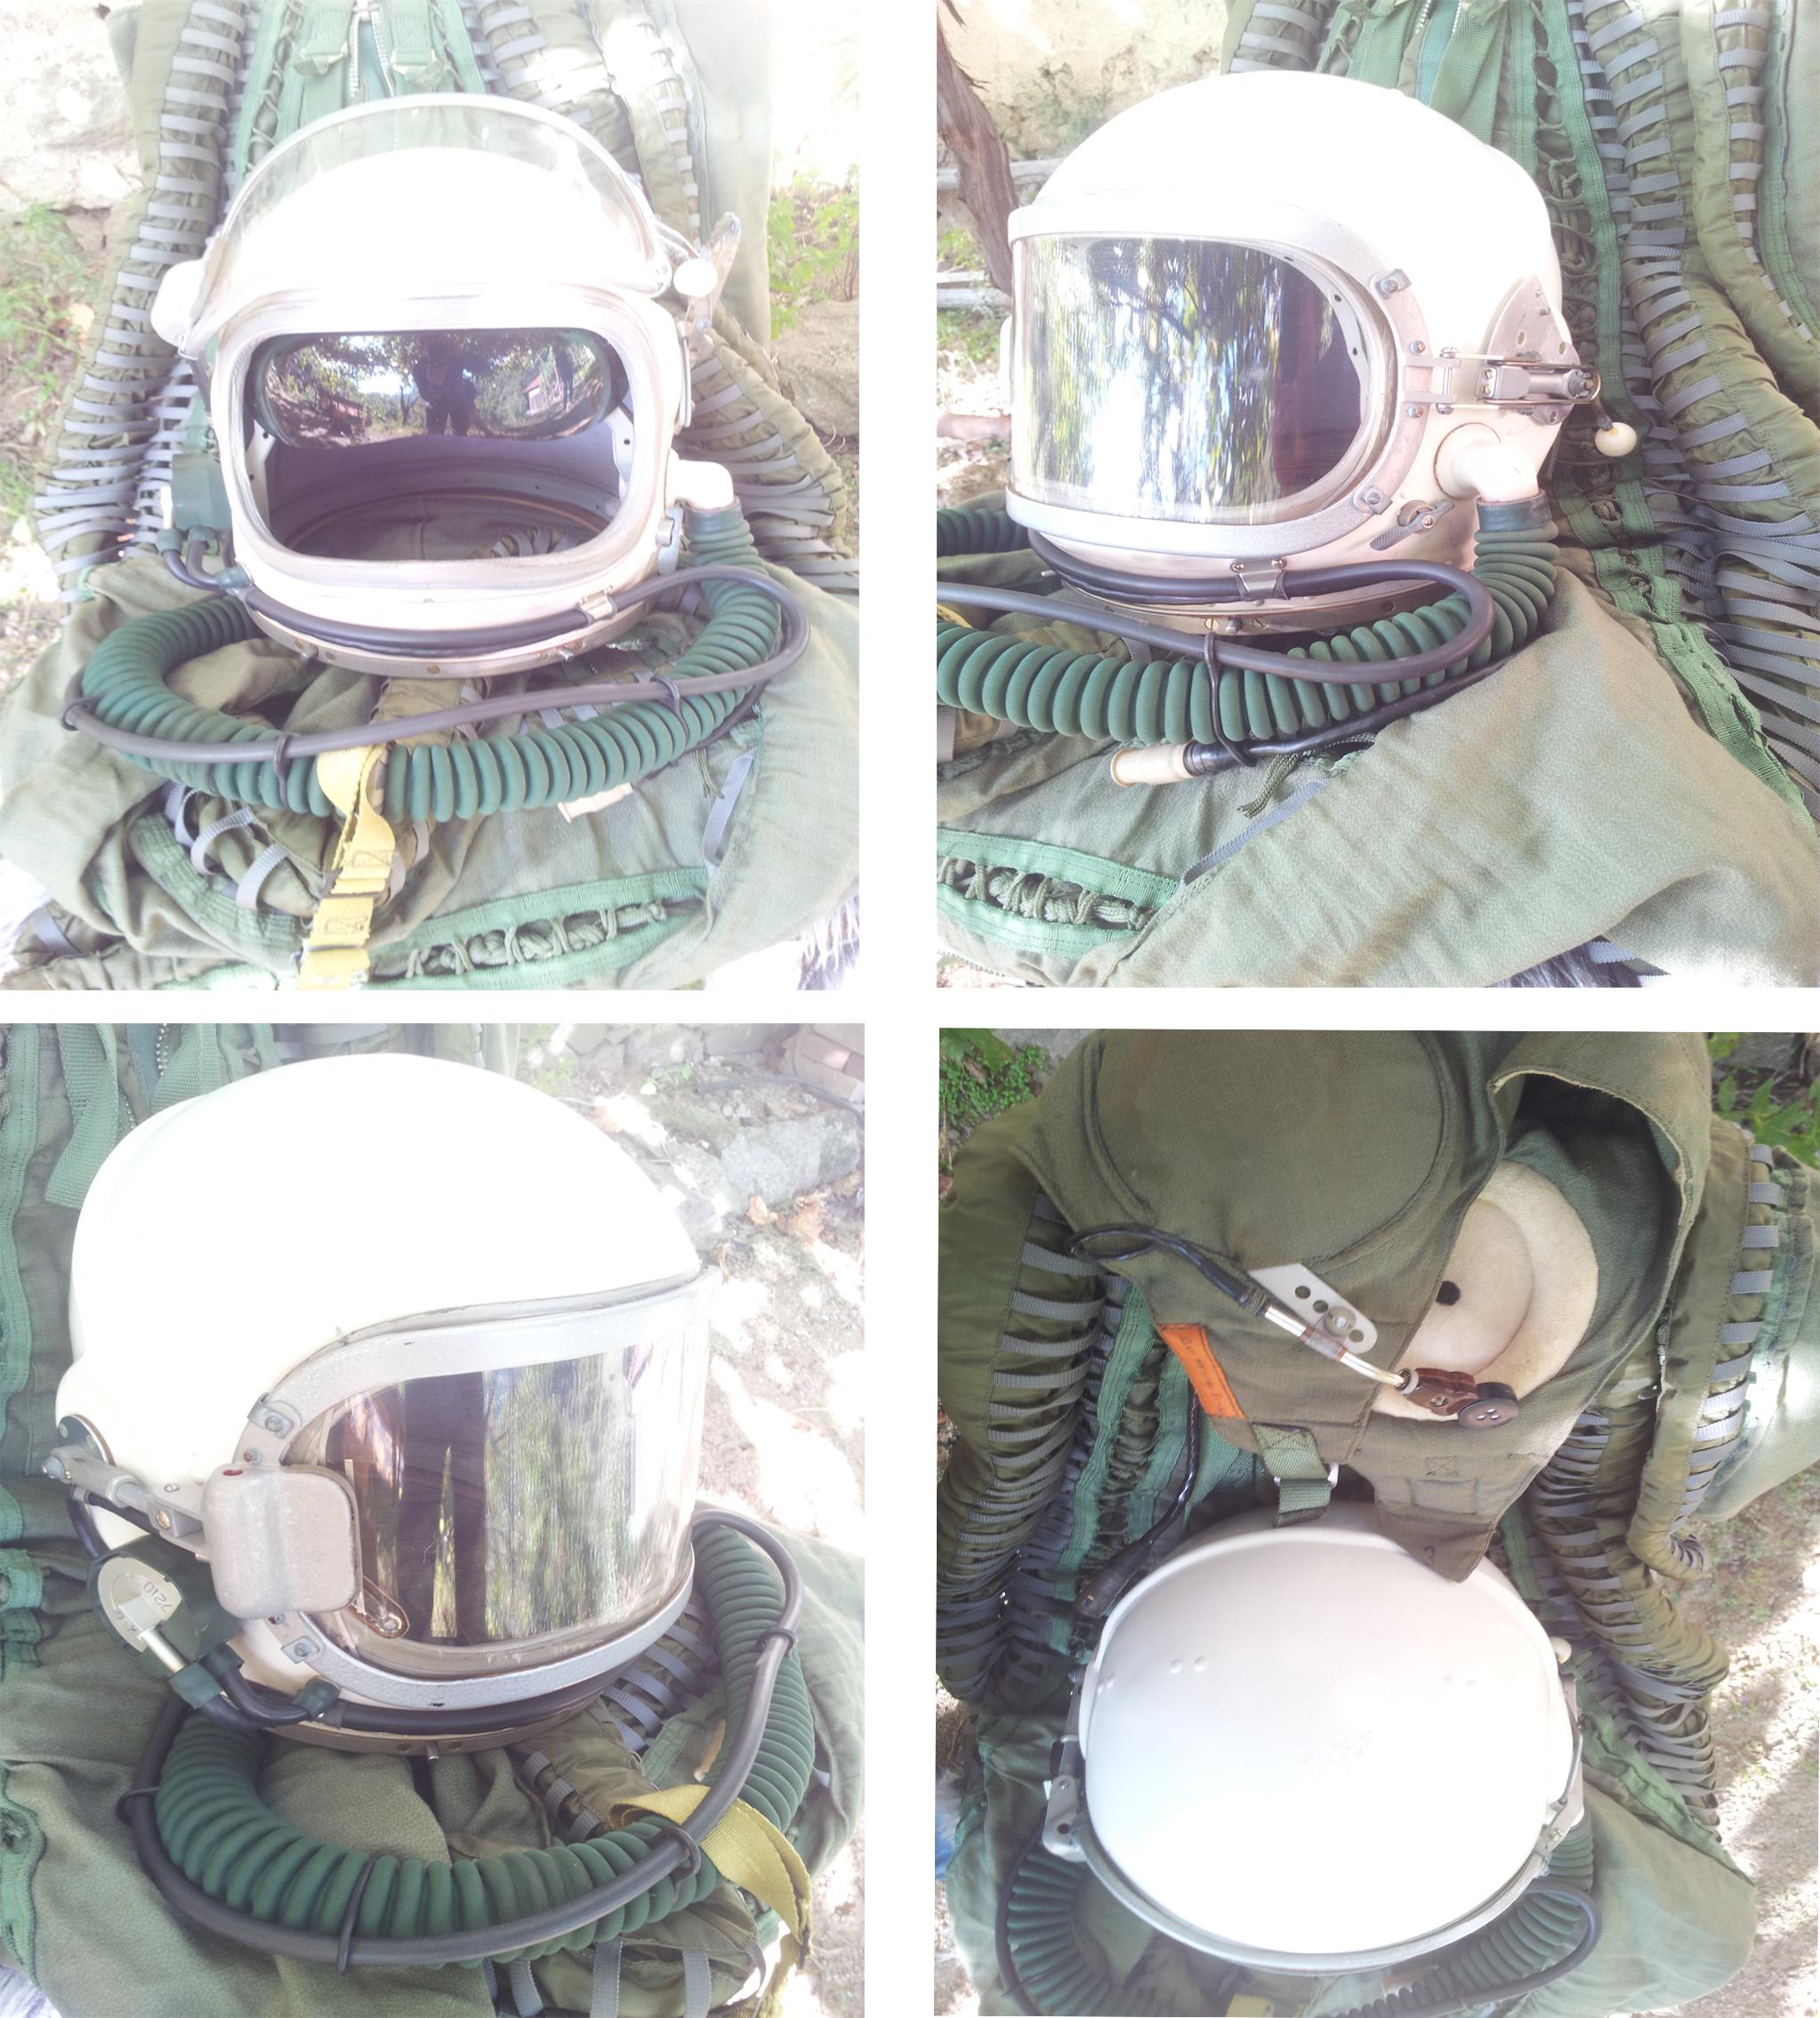 Flight pilot Helmet Pressure suit Cold War MIG 25 1.jpg